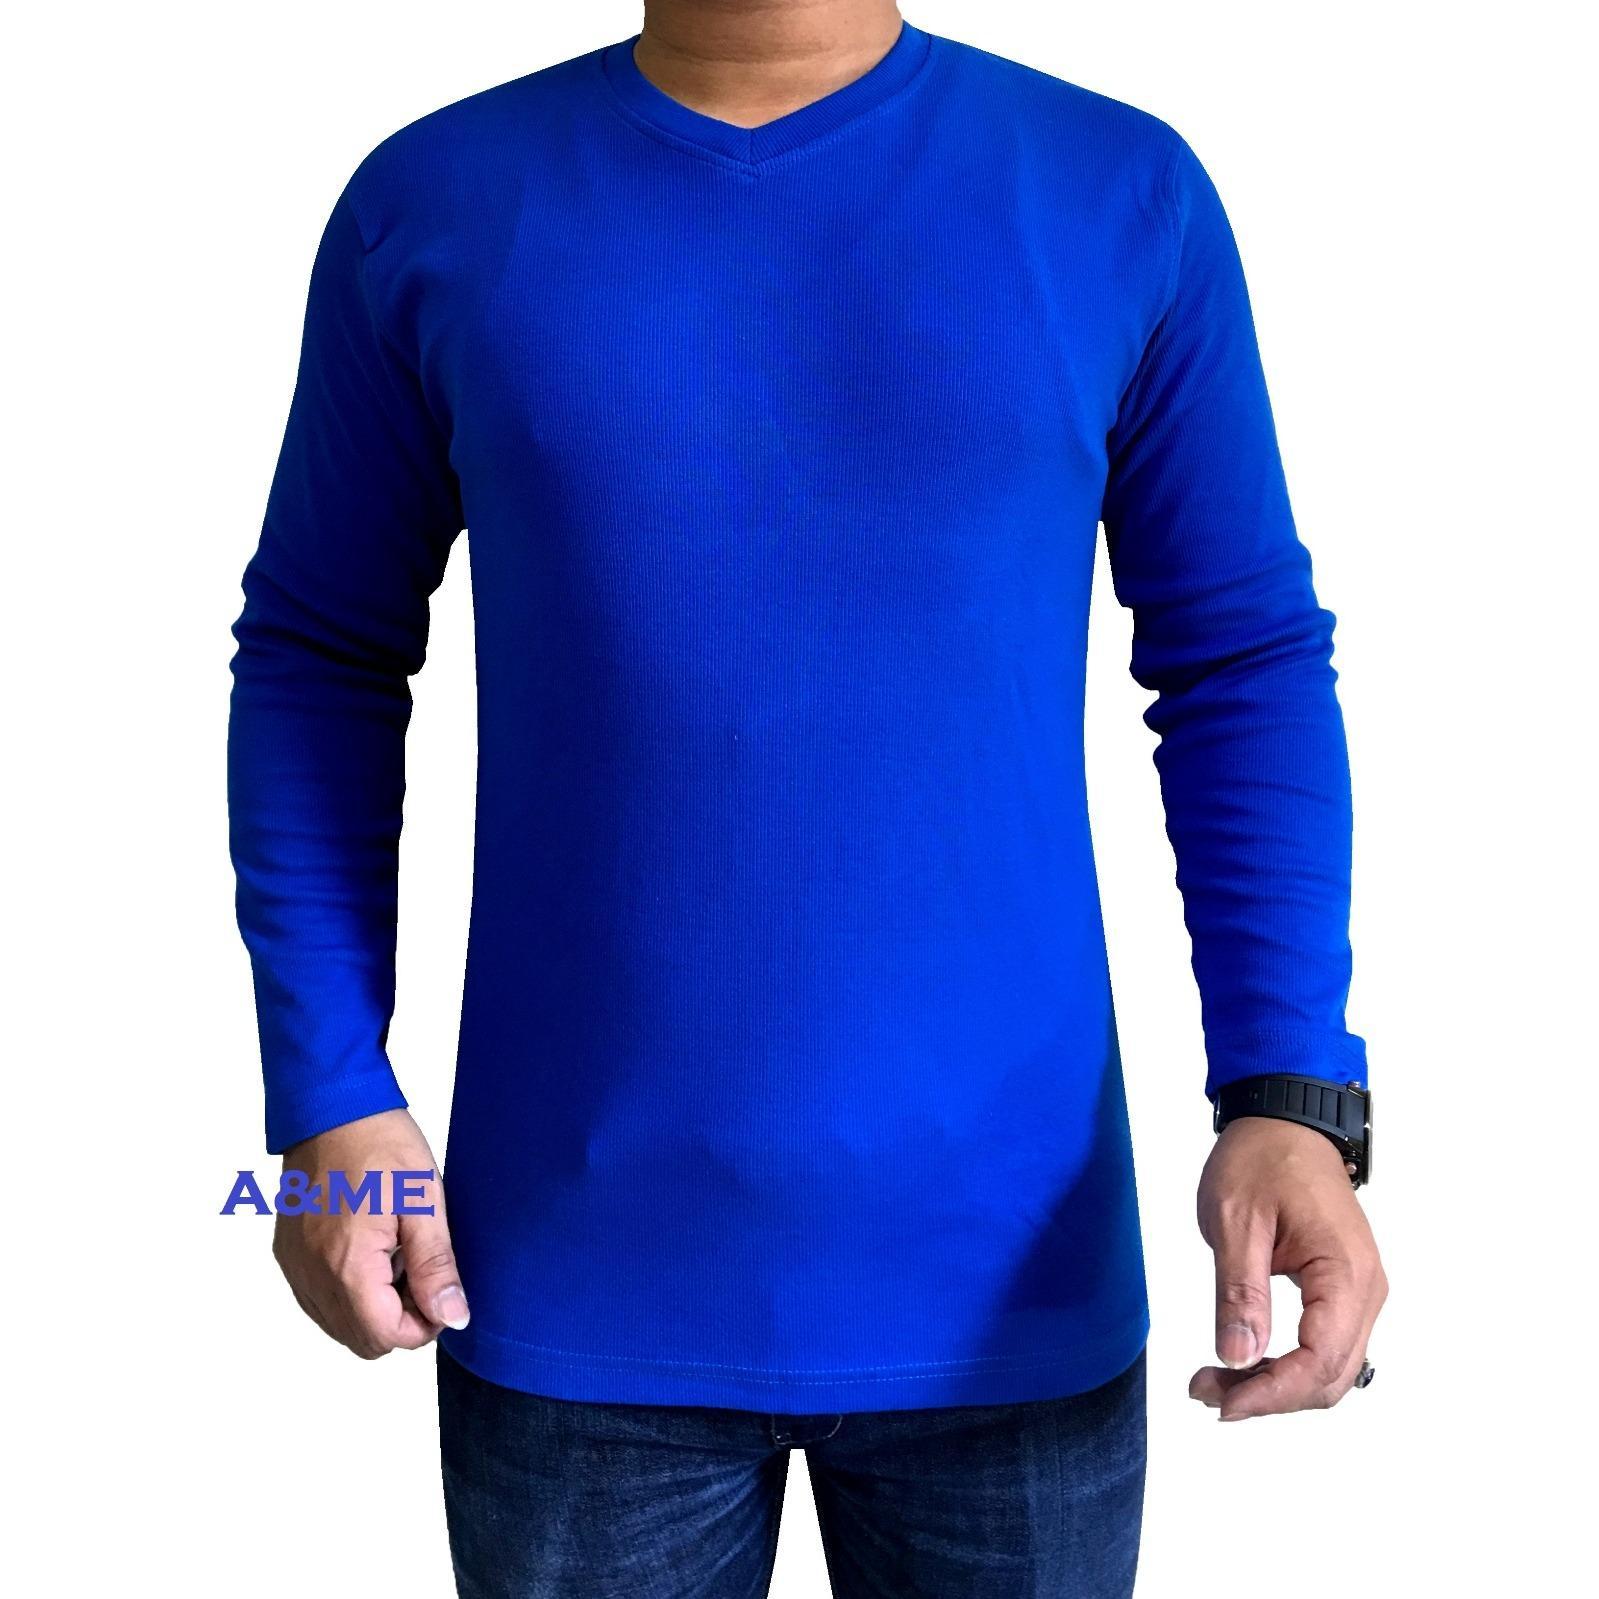 A&ME-Kaos Polos Lengan Panjang 100% Cotton O-Neck Twotone Rip Baju Fashion Atasan Pria Wanita Cowok Cewek Santai Simple Keren Moderen Formal Casual Elegan Murah Bagus Olah Raga